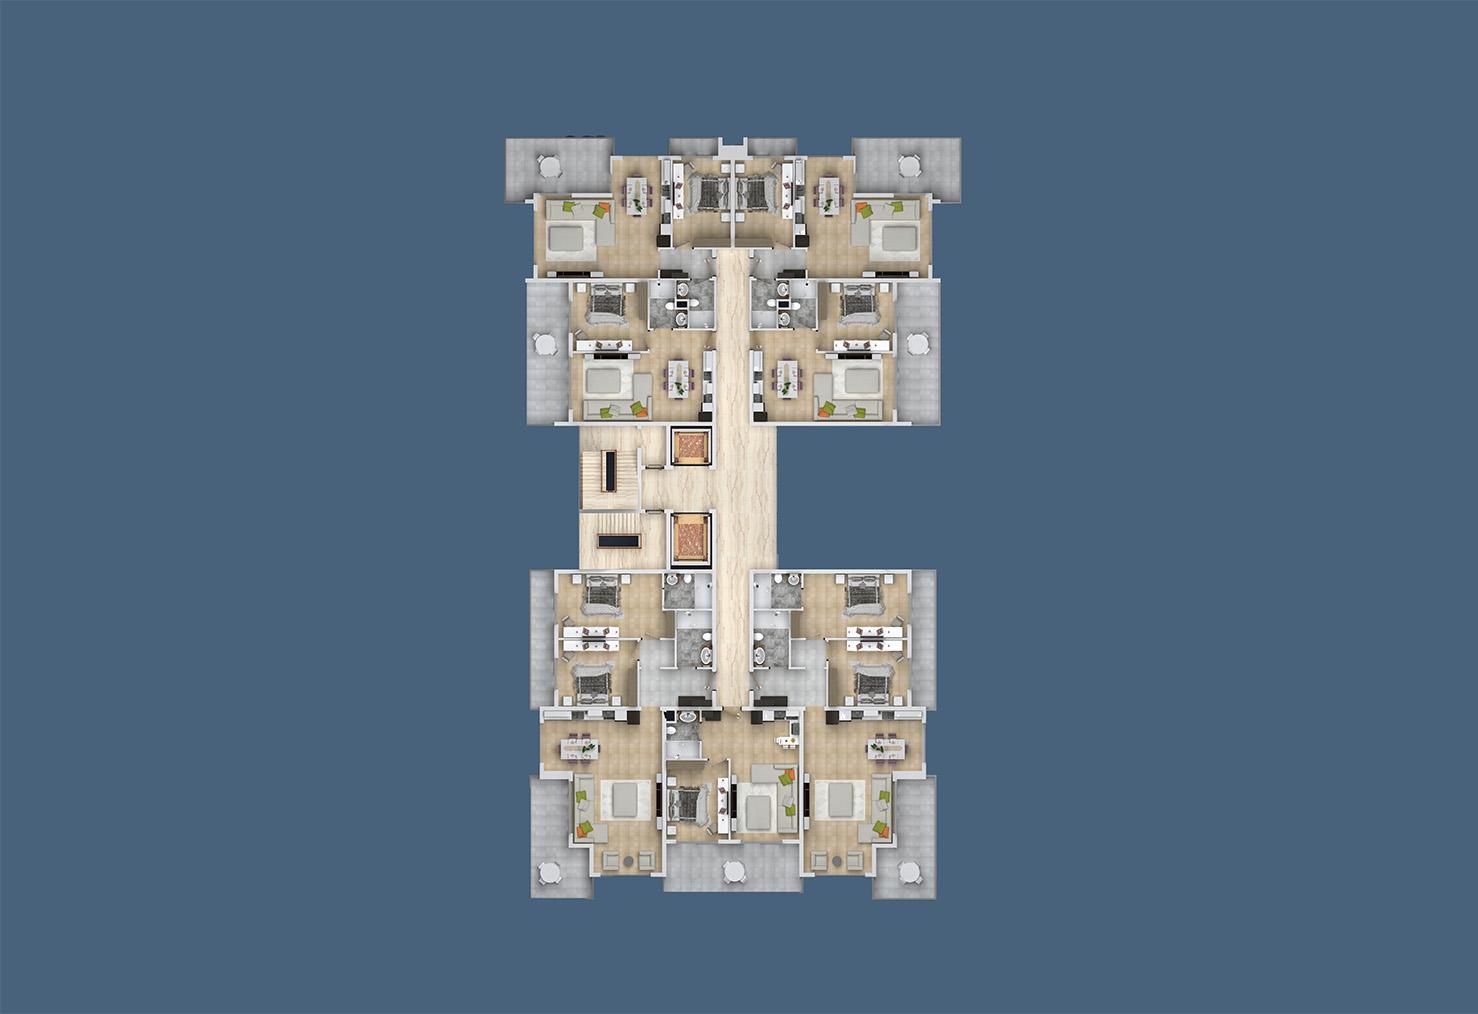 План расположения квартир 5 этаж B Yekta Kingdom Trade Center